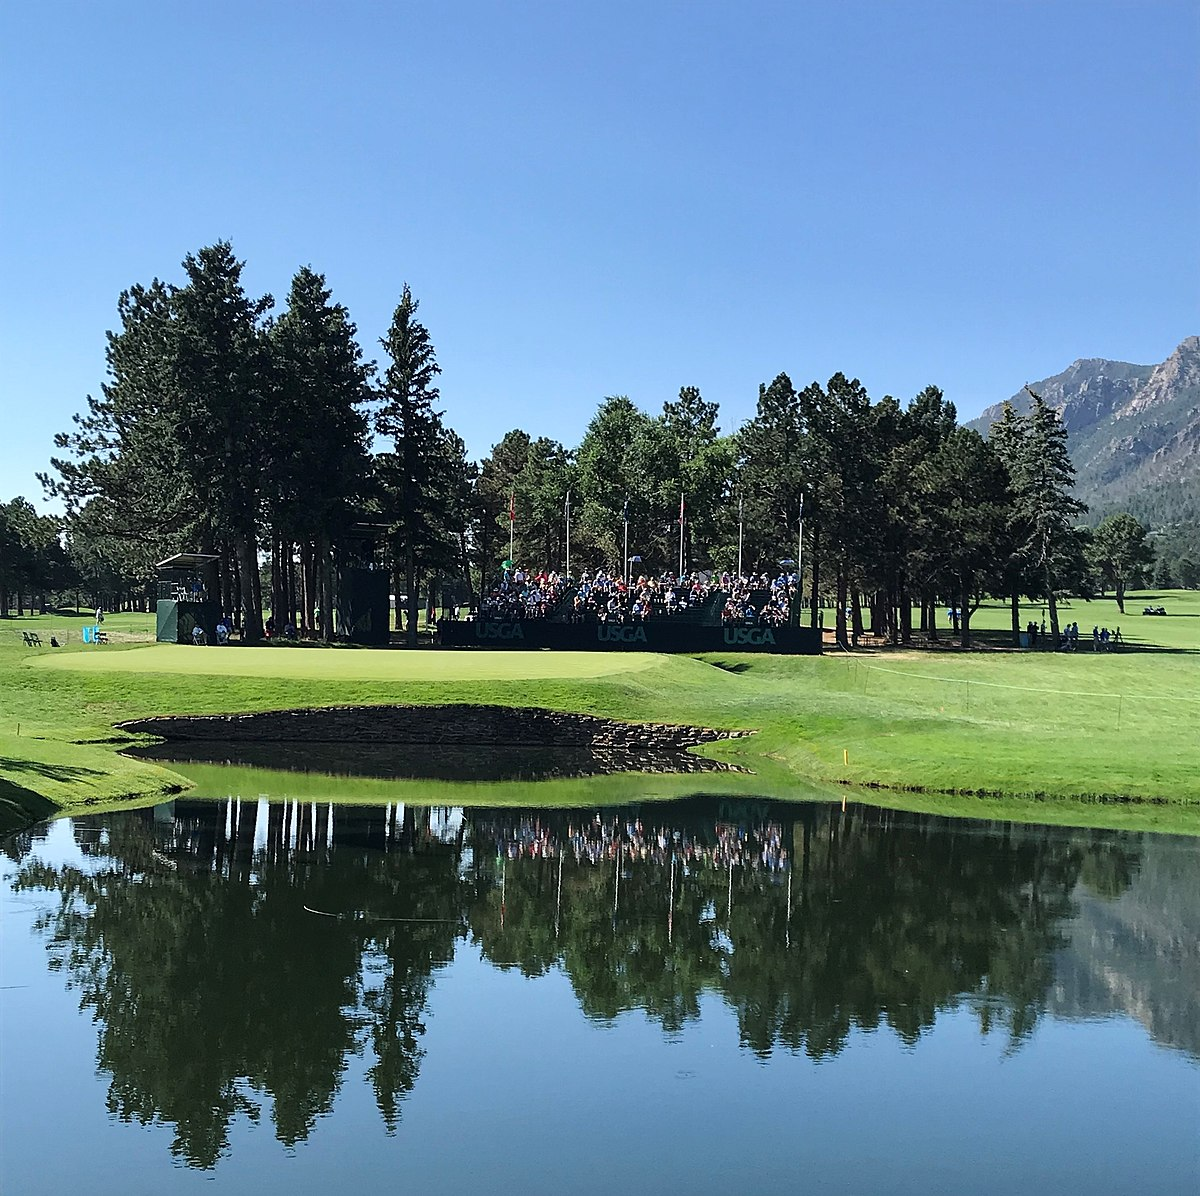 golf course broadmoor club east courses colorado springs wikipedia